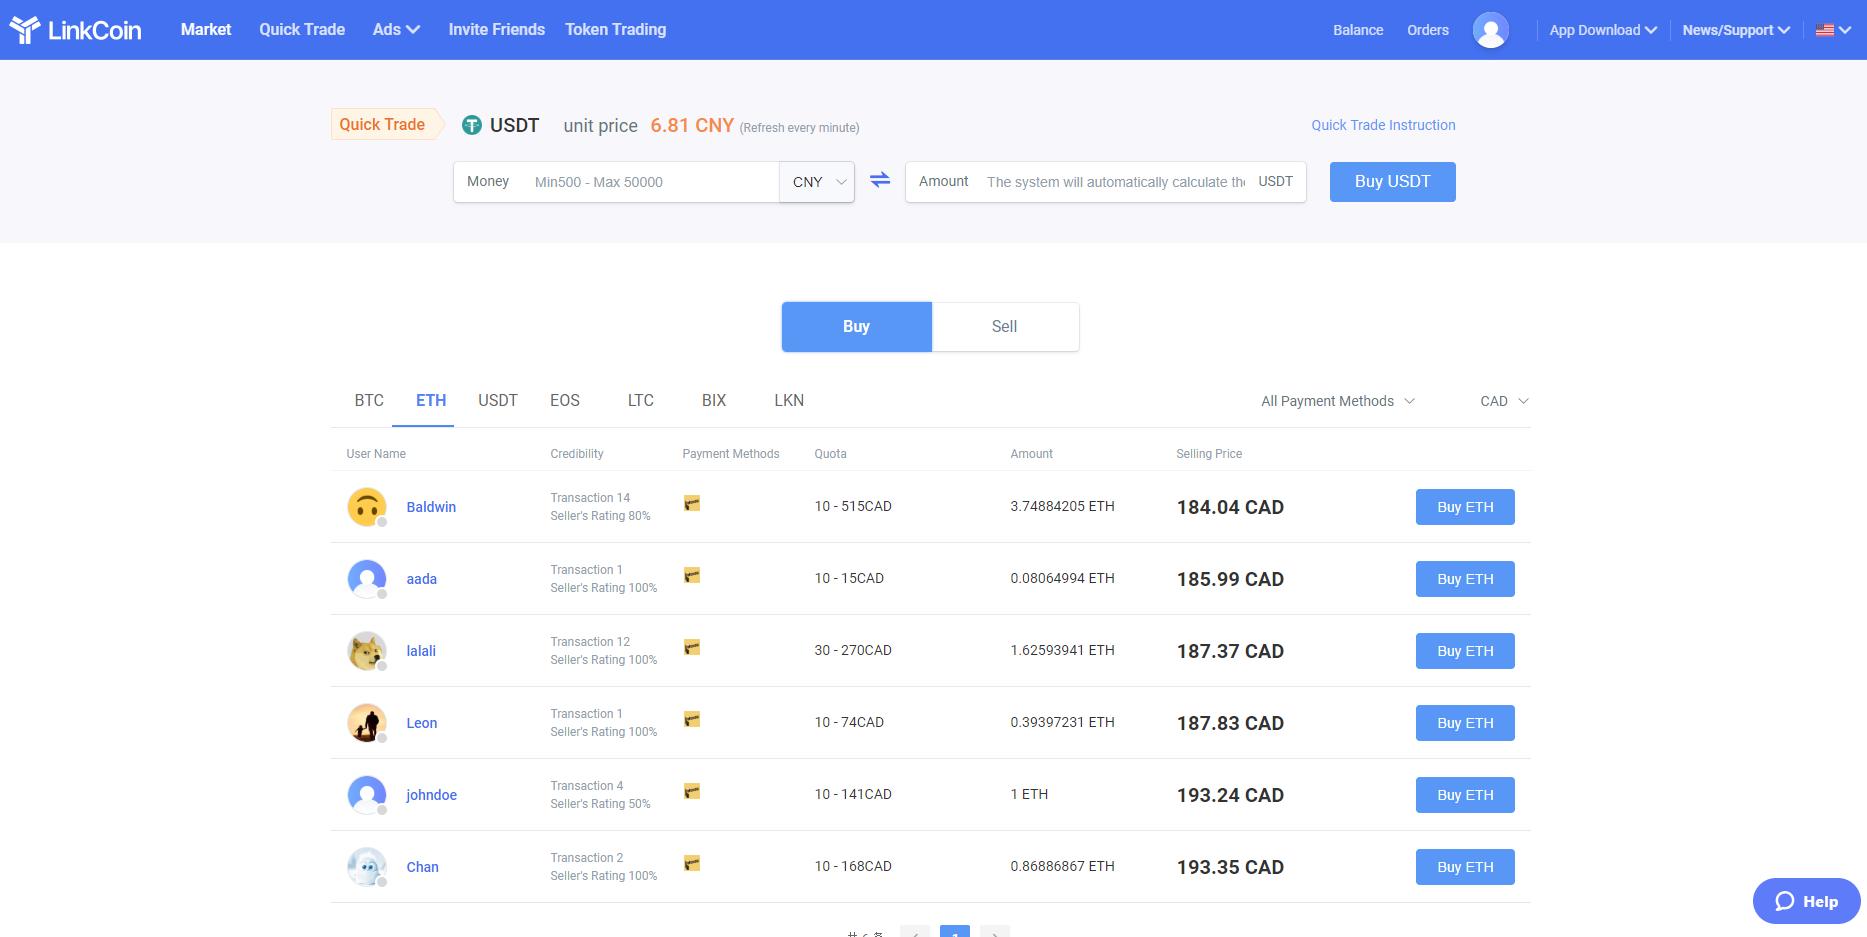 LinkCoin Purchase Interface